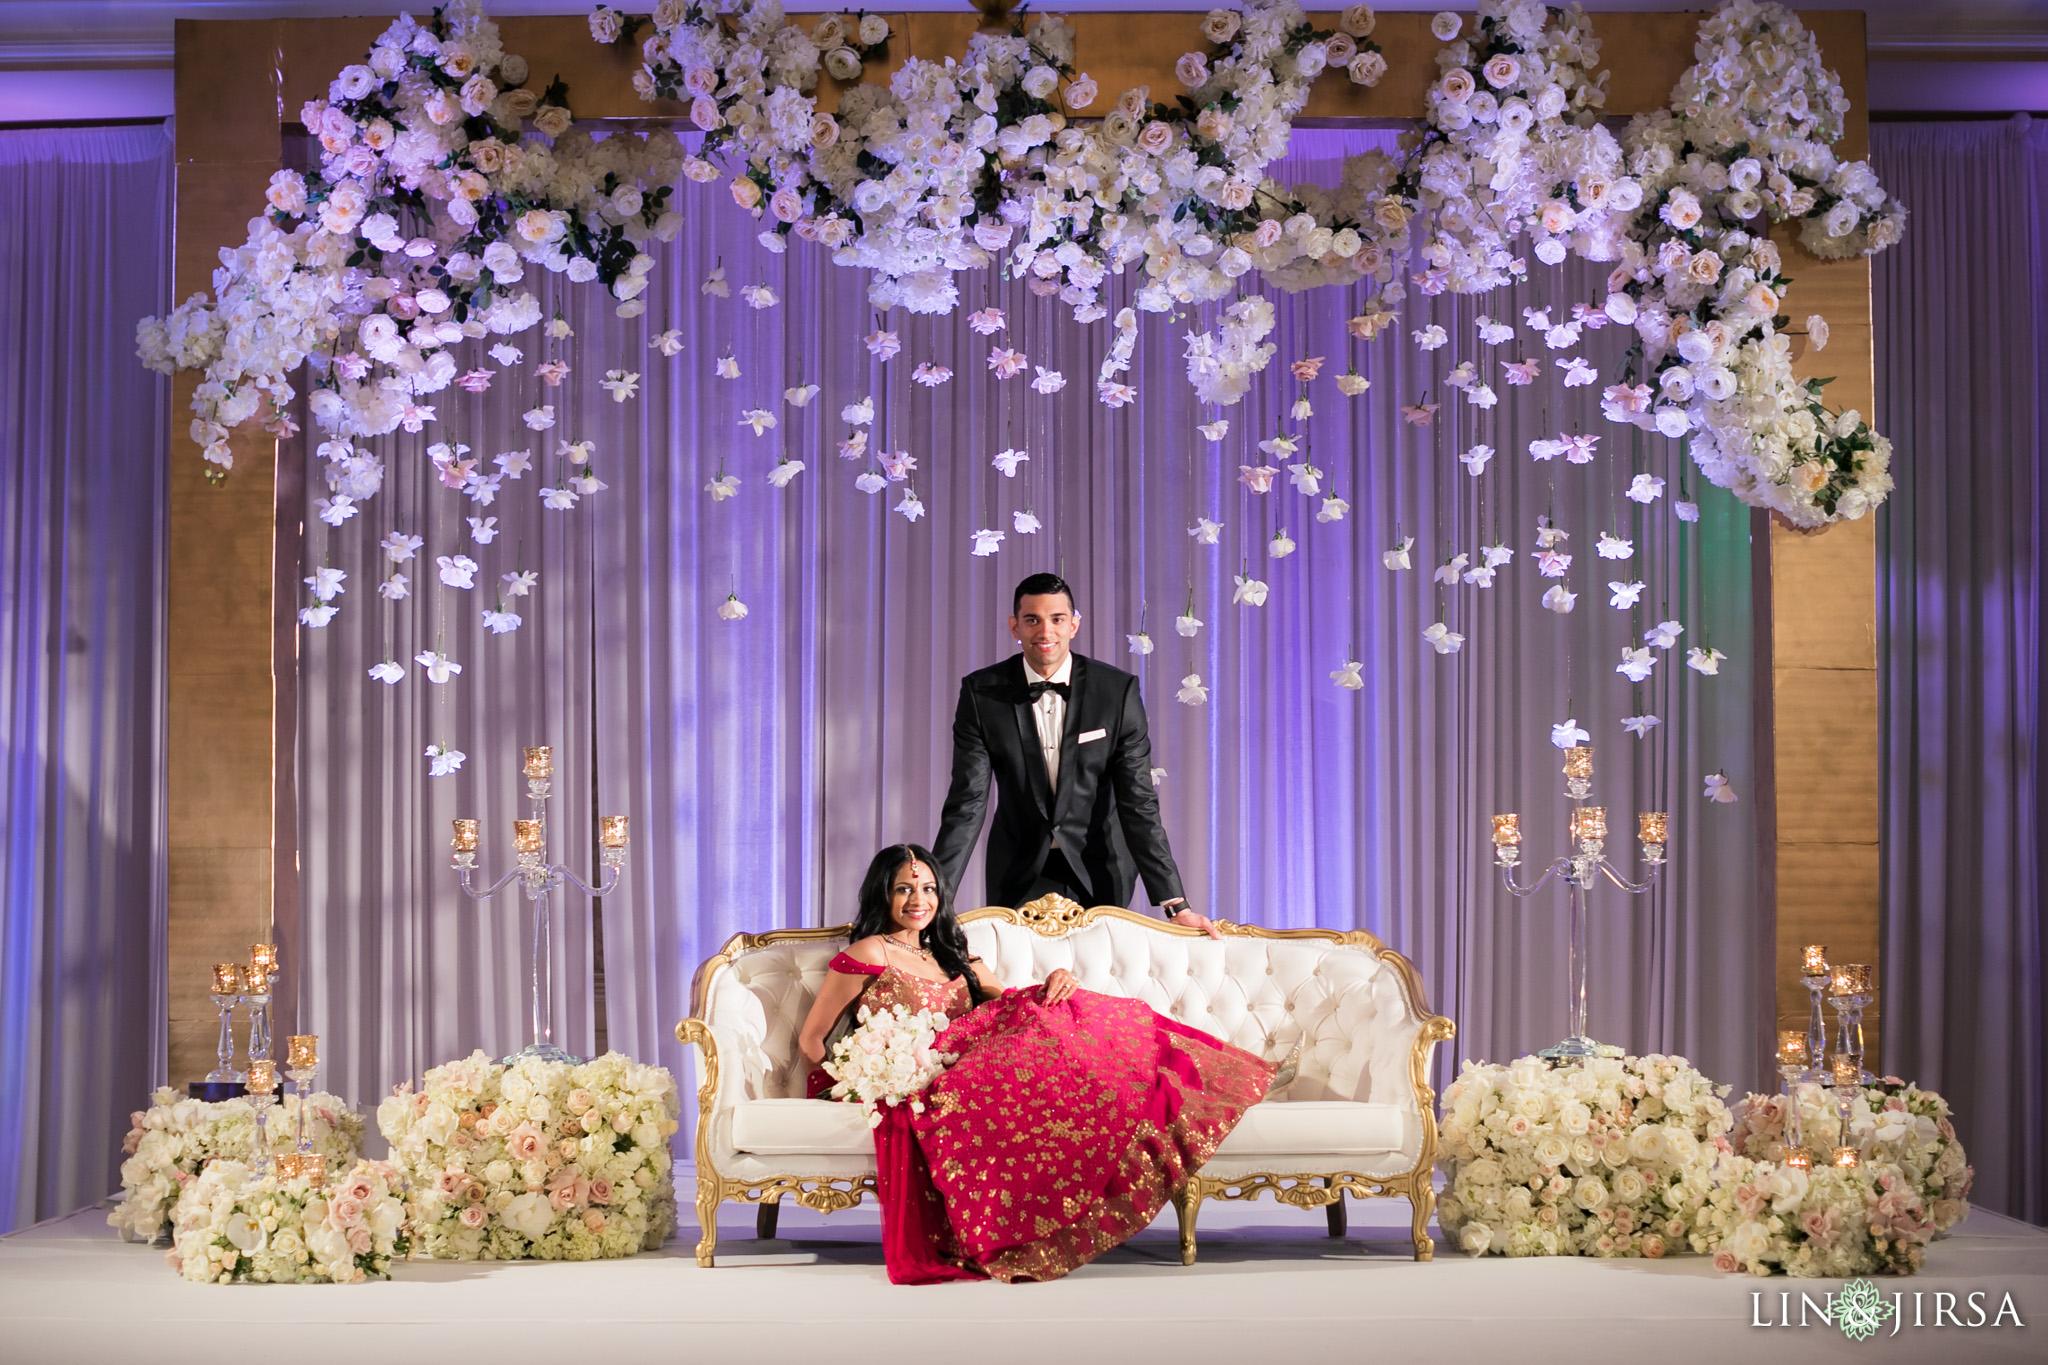 Decoration Ideas For Wedding: Montage Laguna Beach Indian Wedding